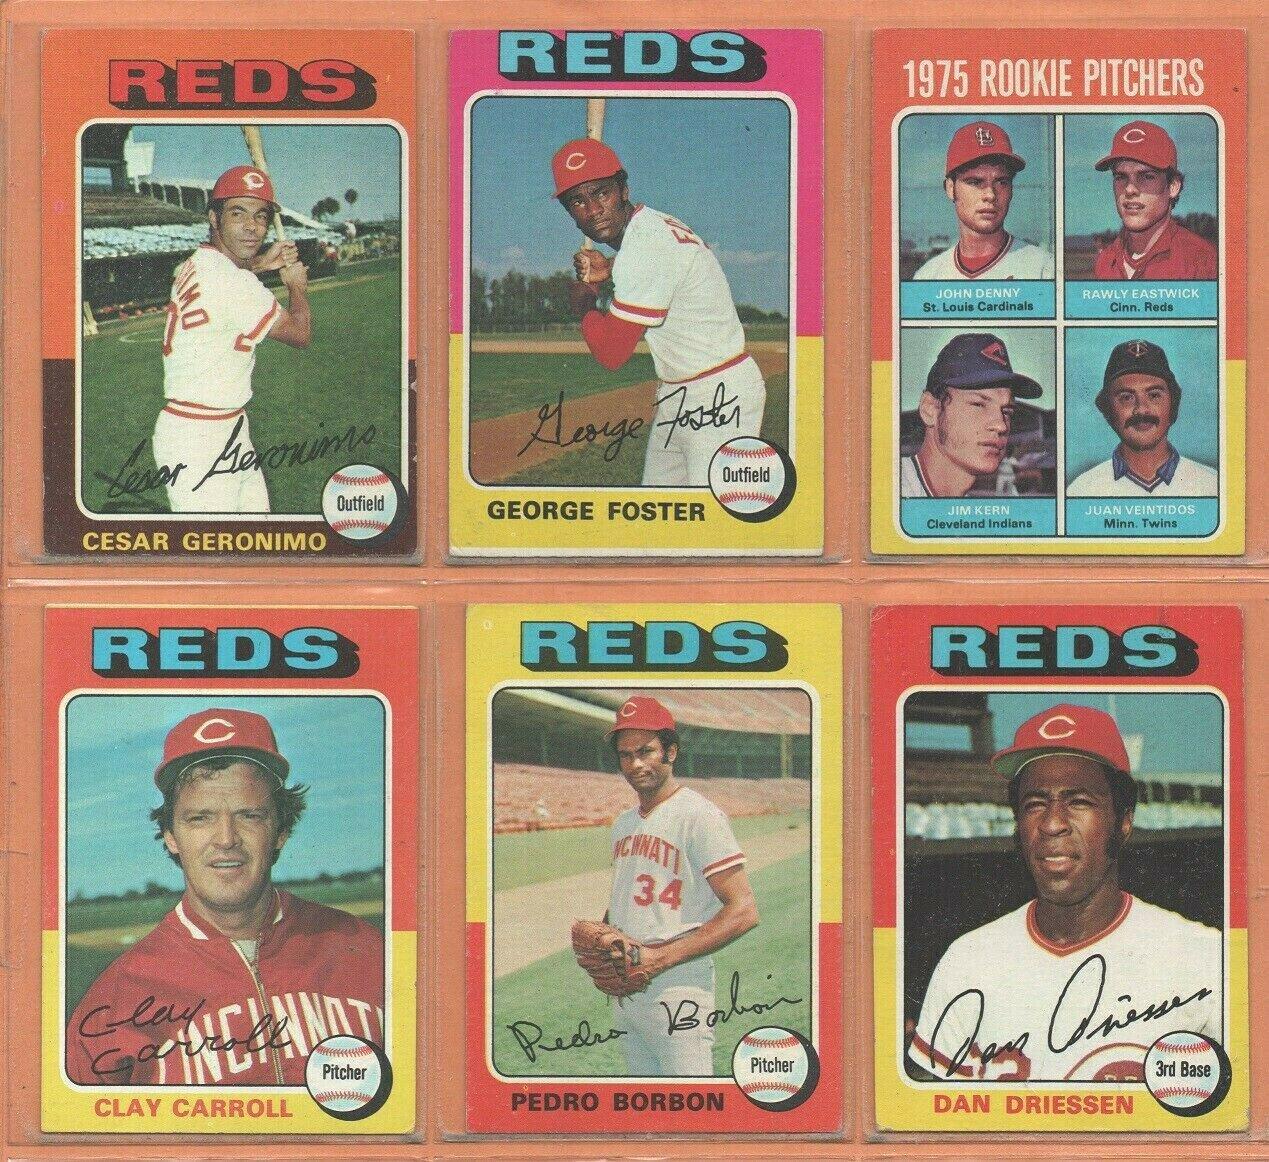 1975 1976 1977 Topps Cincinnati Reds Team Lot 22 diff Pete Rose George Foster Rawley Eastwick RC